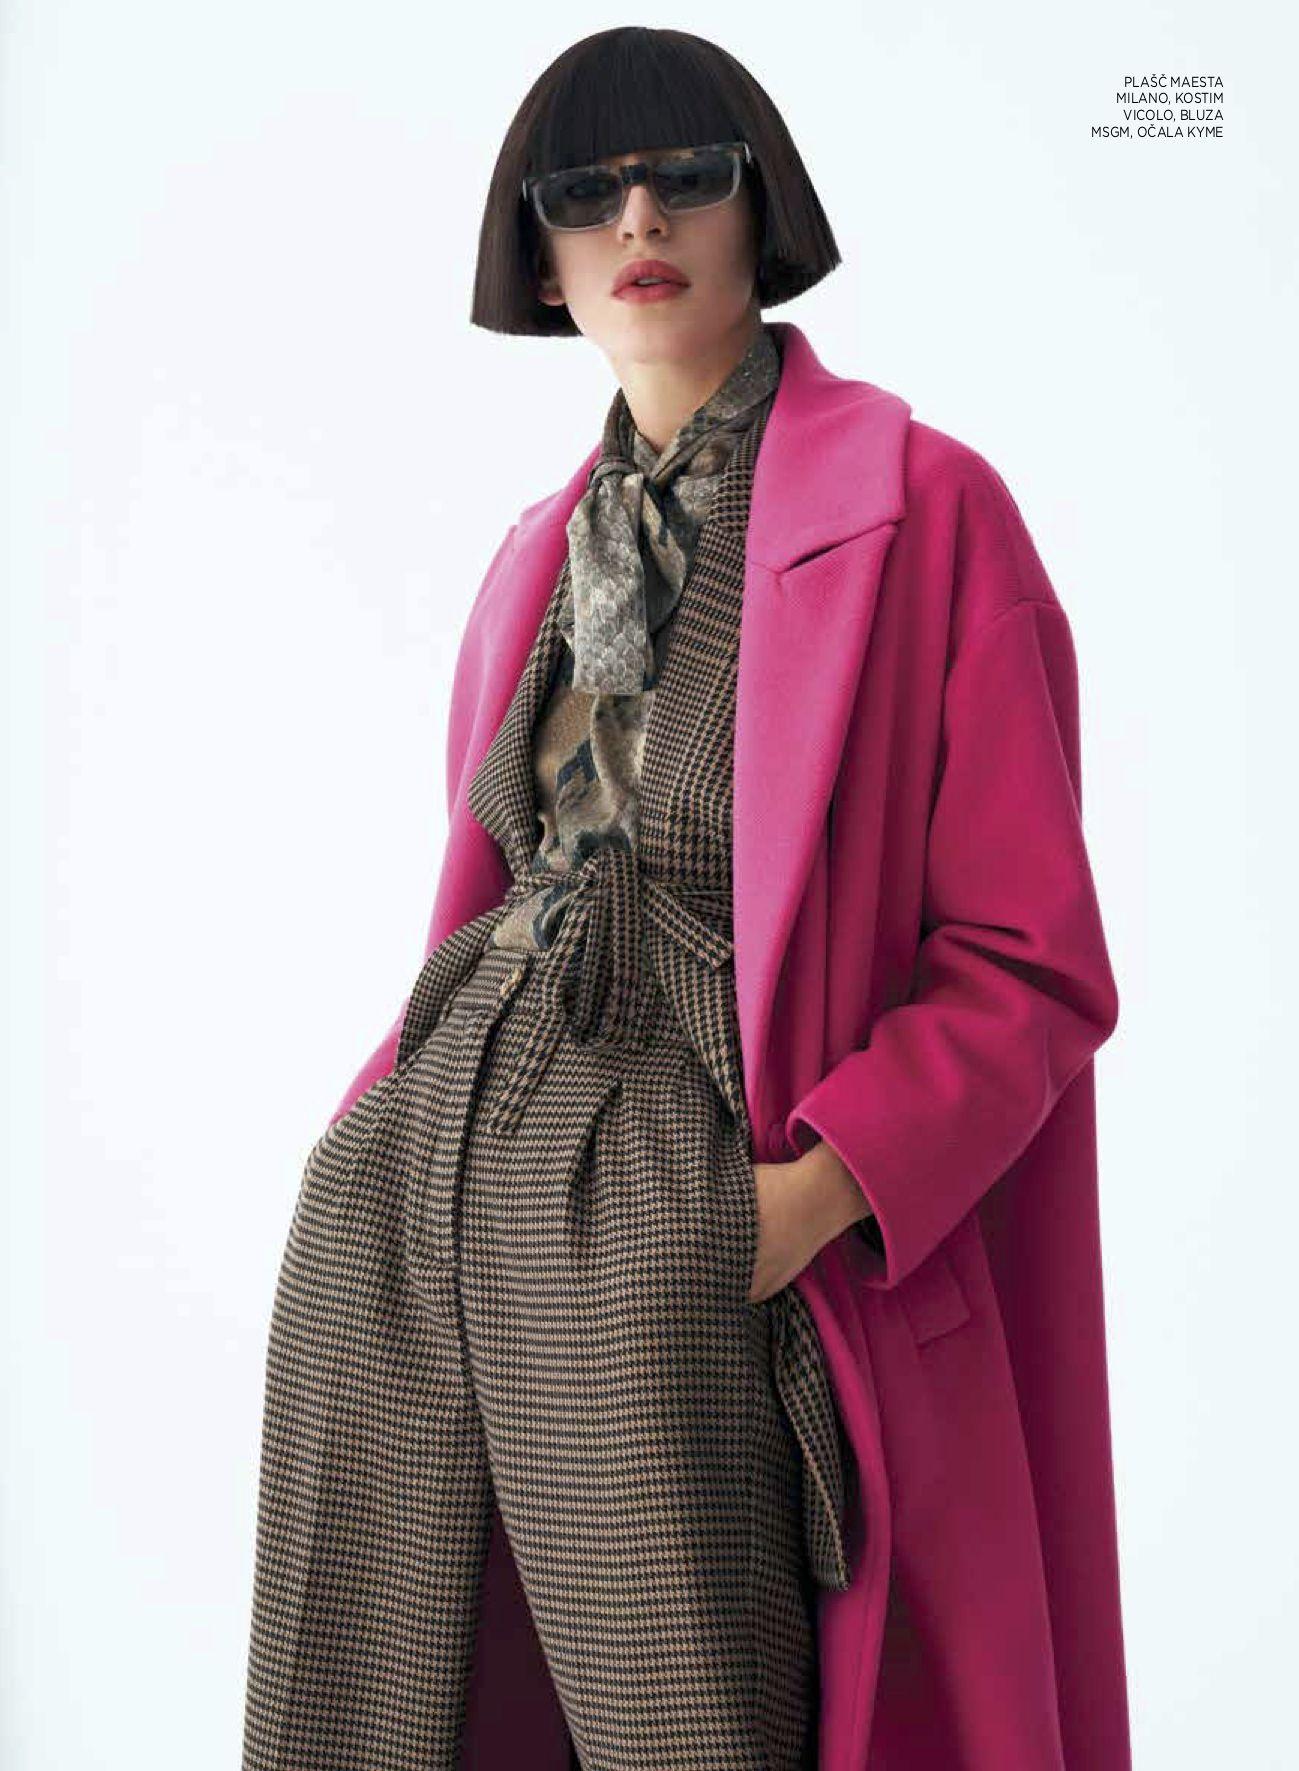 Gloss Magazine Cover - Pic. 5